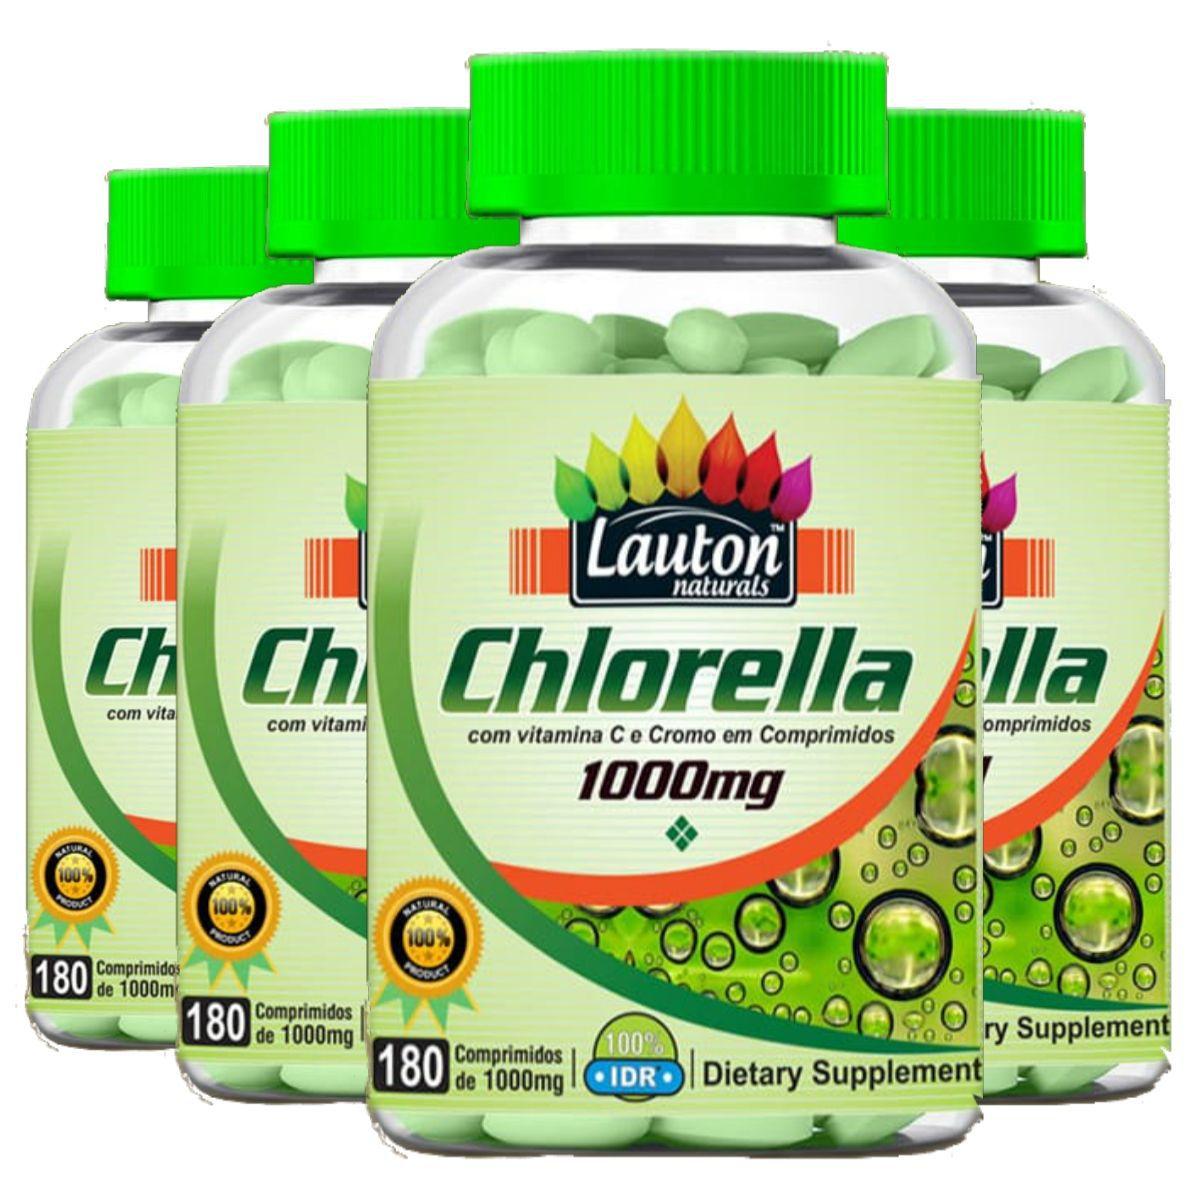 Kit 4 Chlorella Lauton Naturals - 1000mg 180 Comprimidos